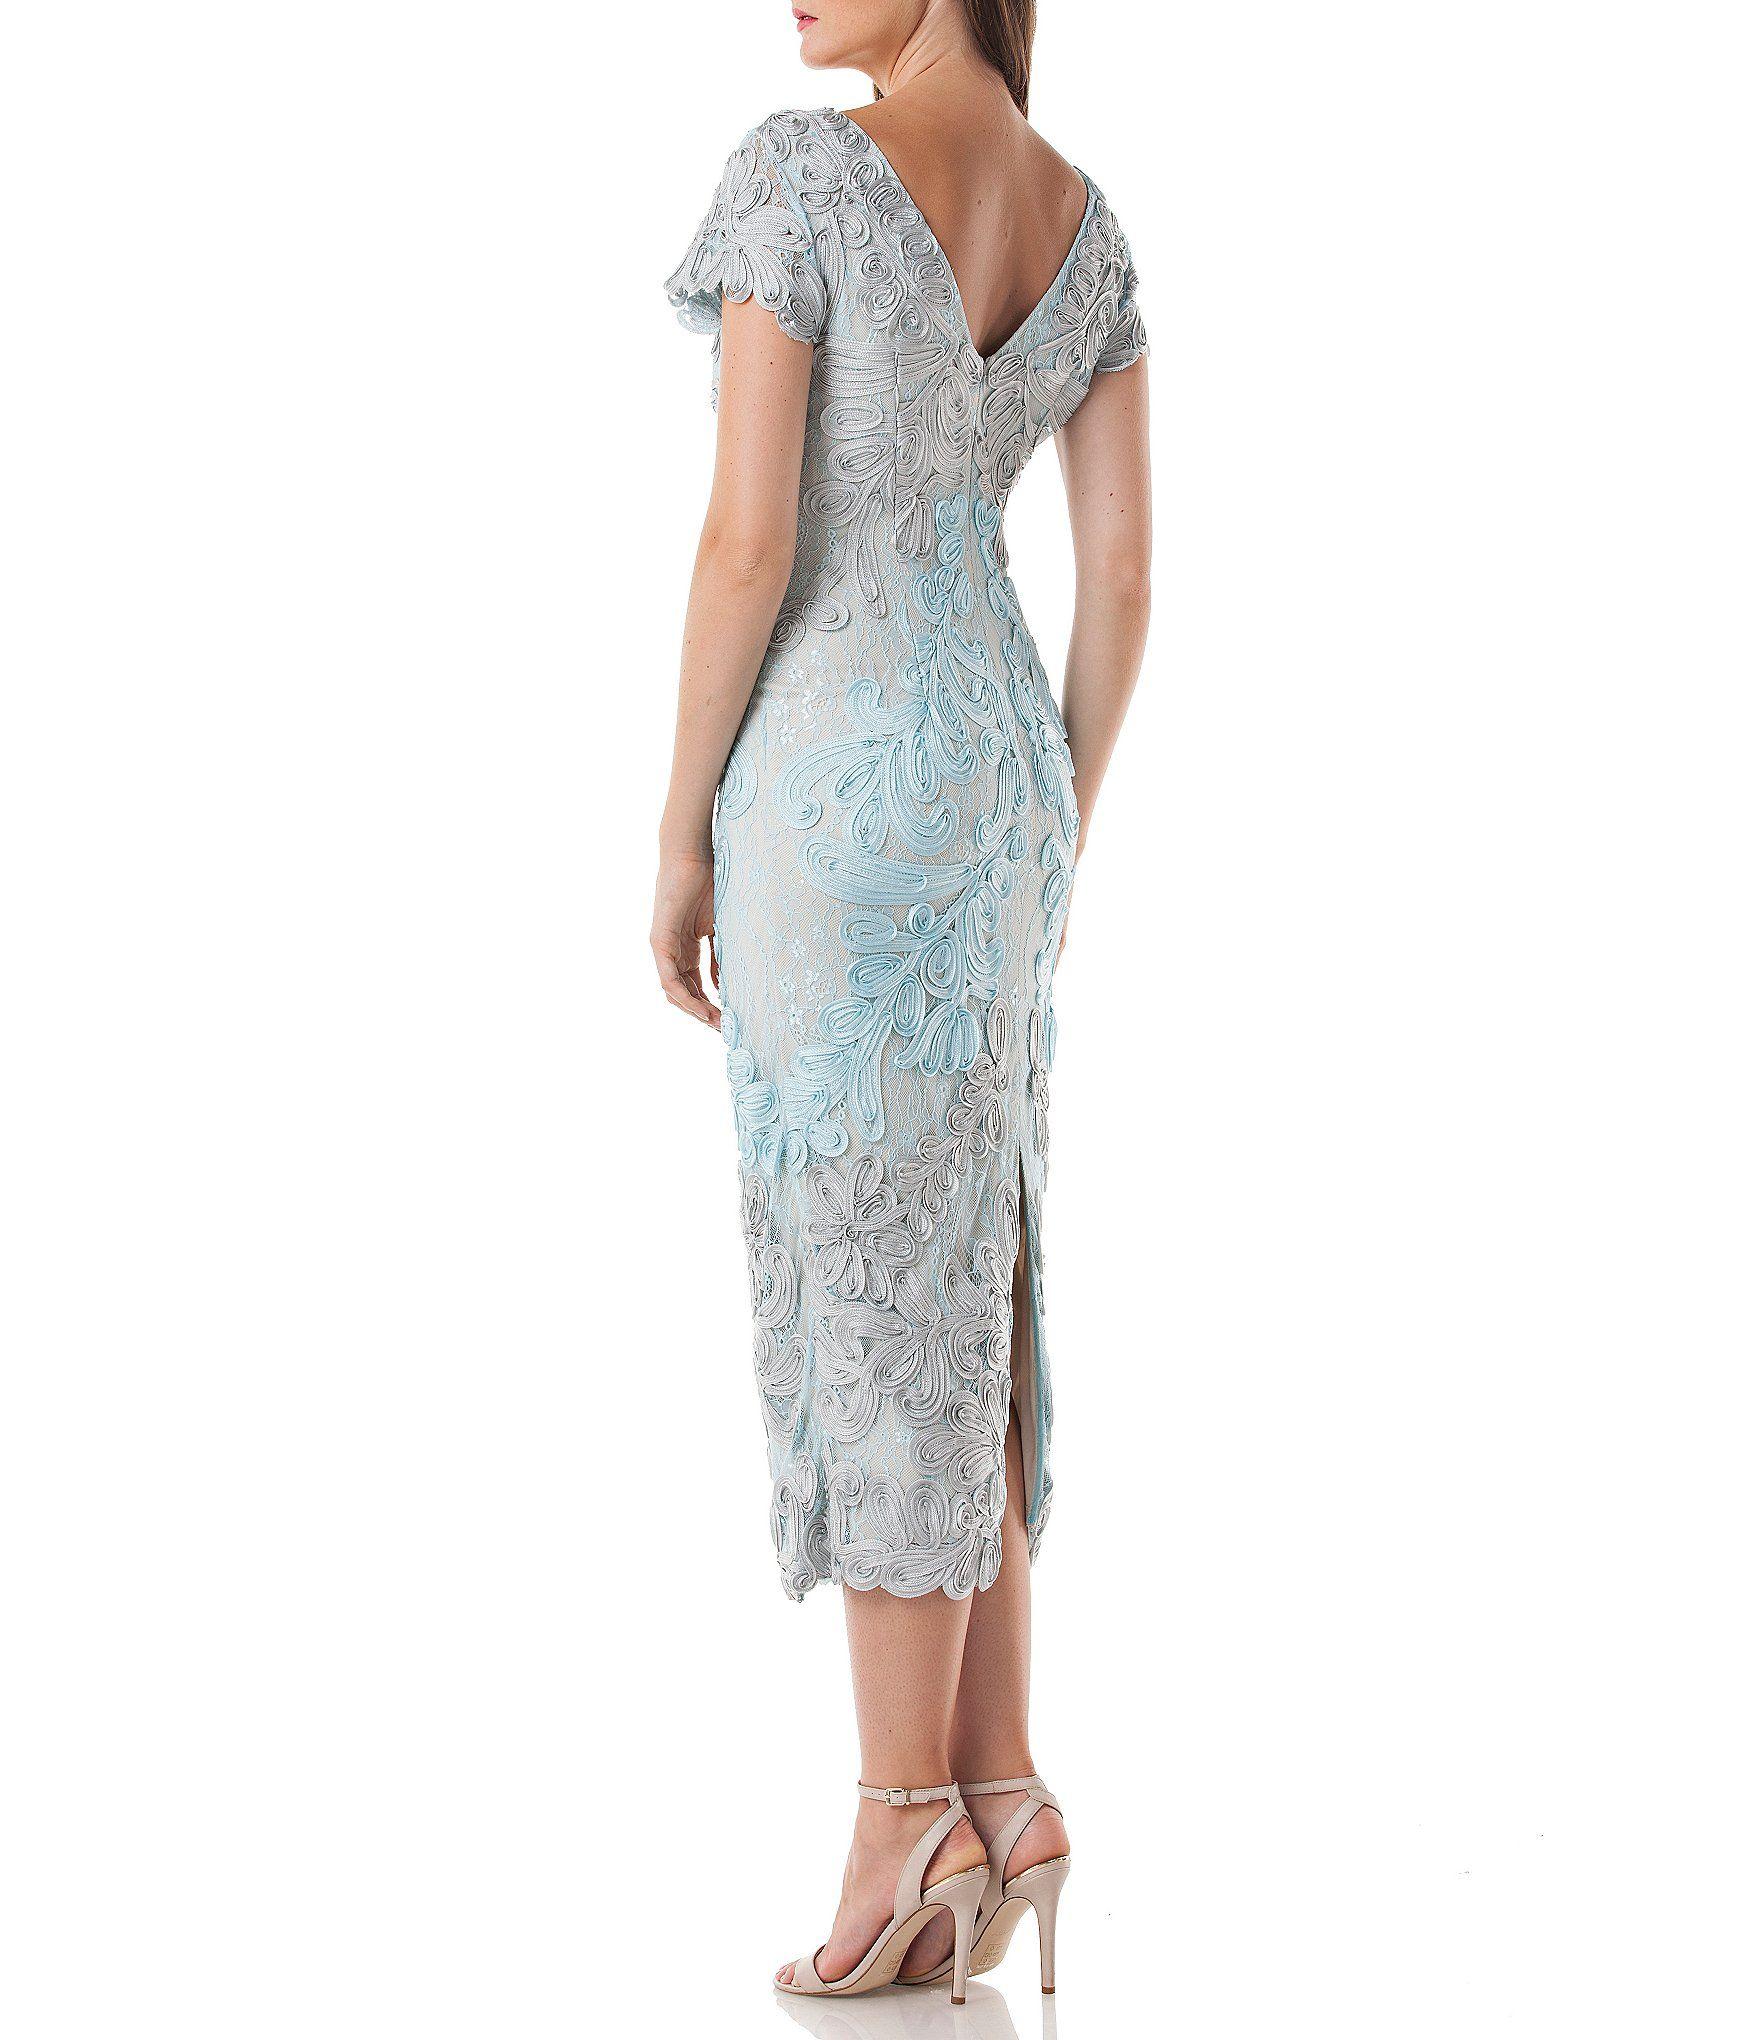 Wedding dresses dillards  JS Collections Soutache Overlay Midi Dress  ВЕЧЕРНИЕ ПЛАТЬЯ